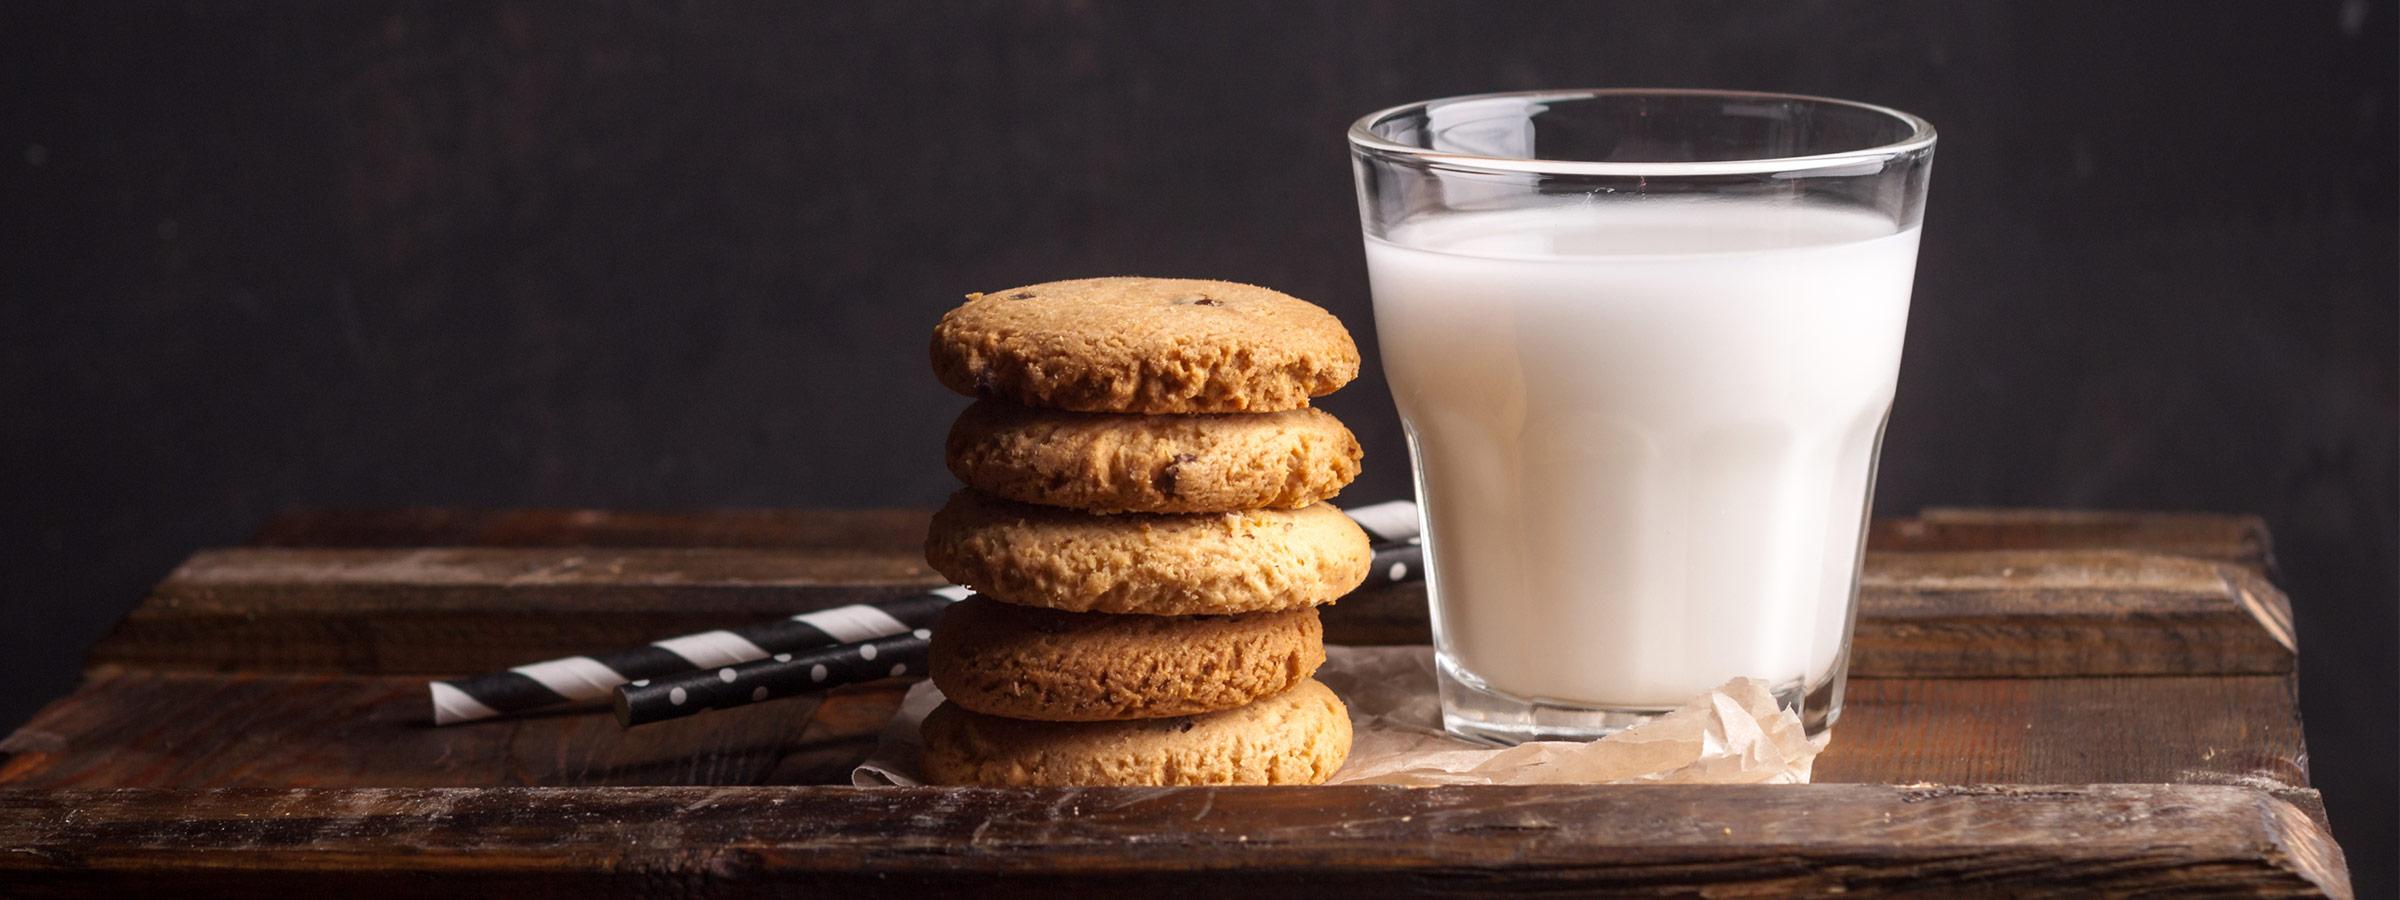 marcona almond milk main image